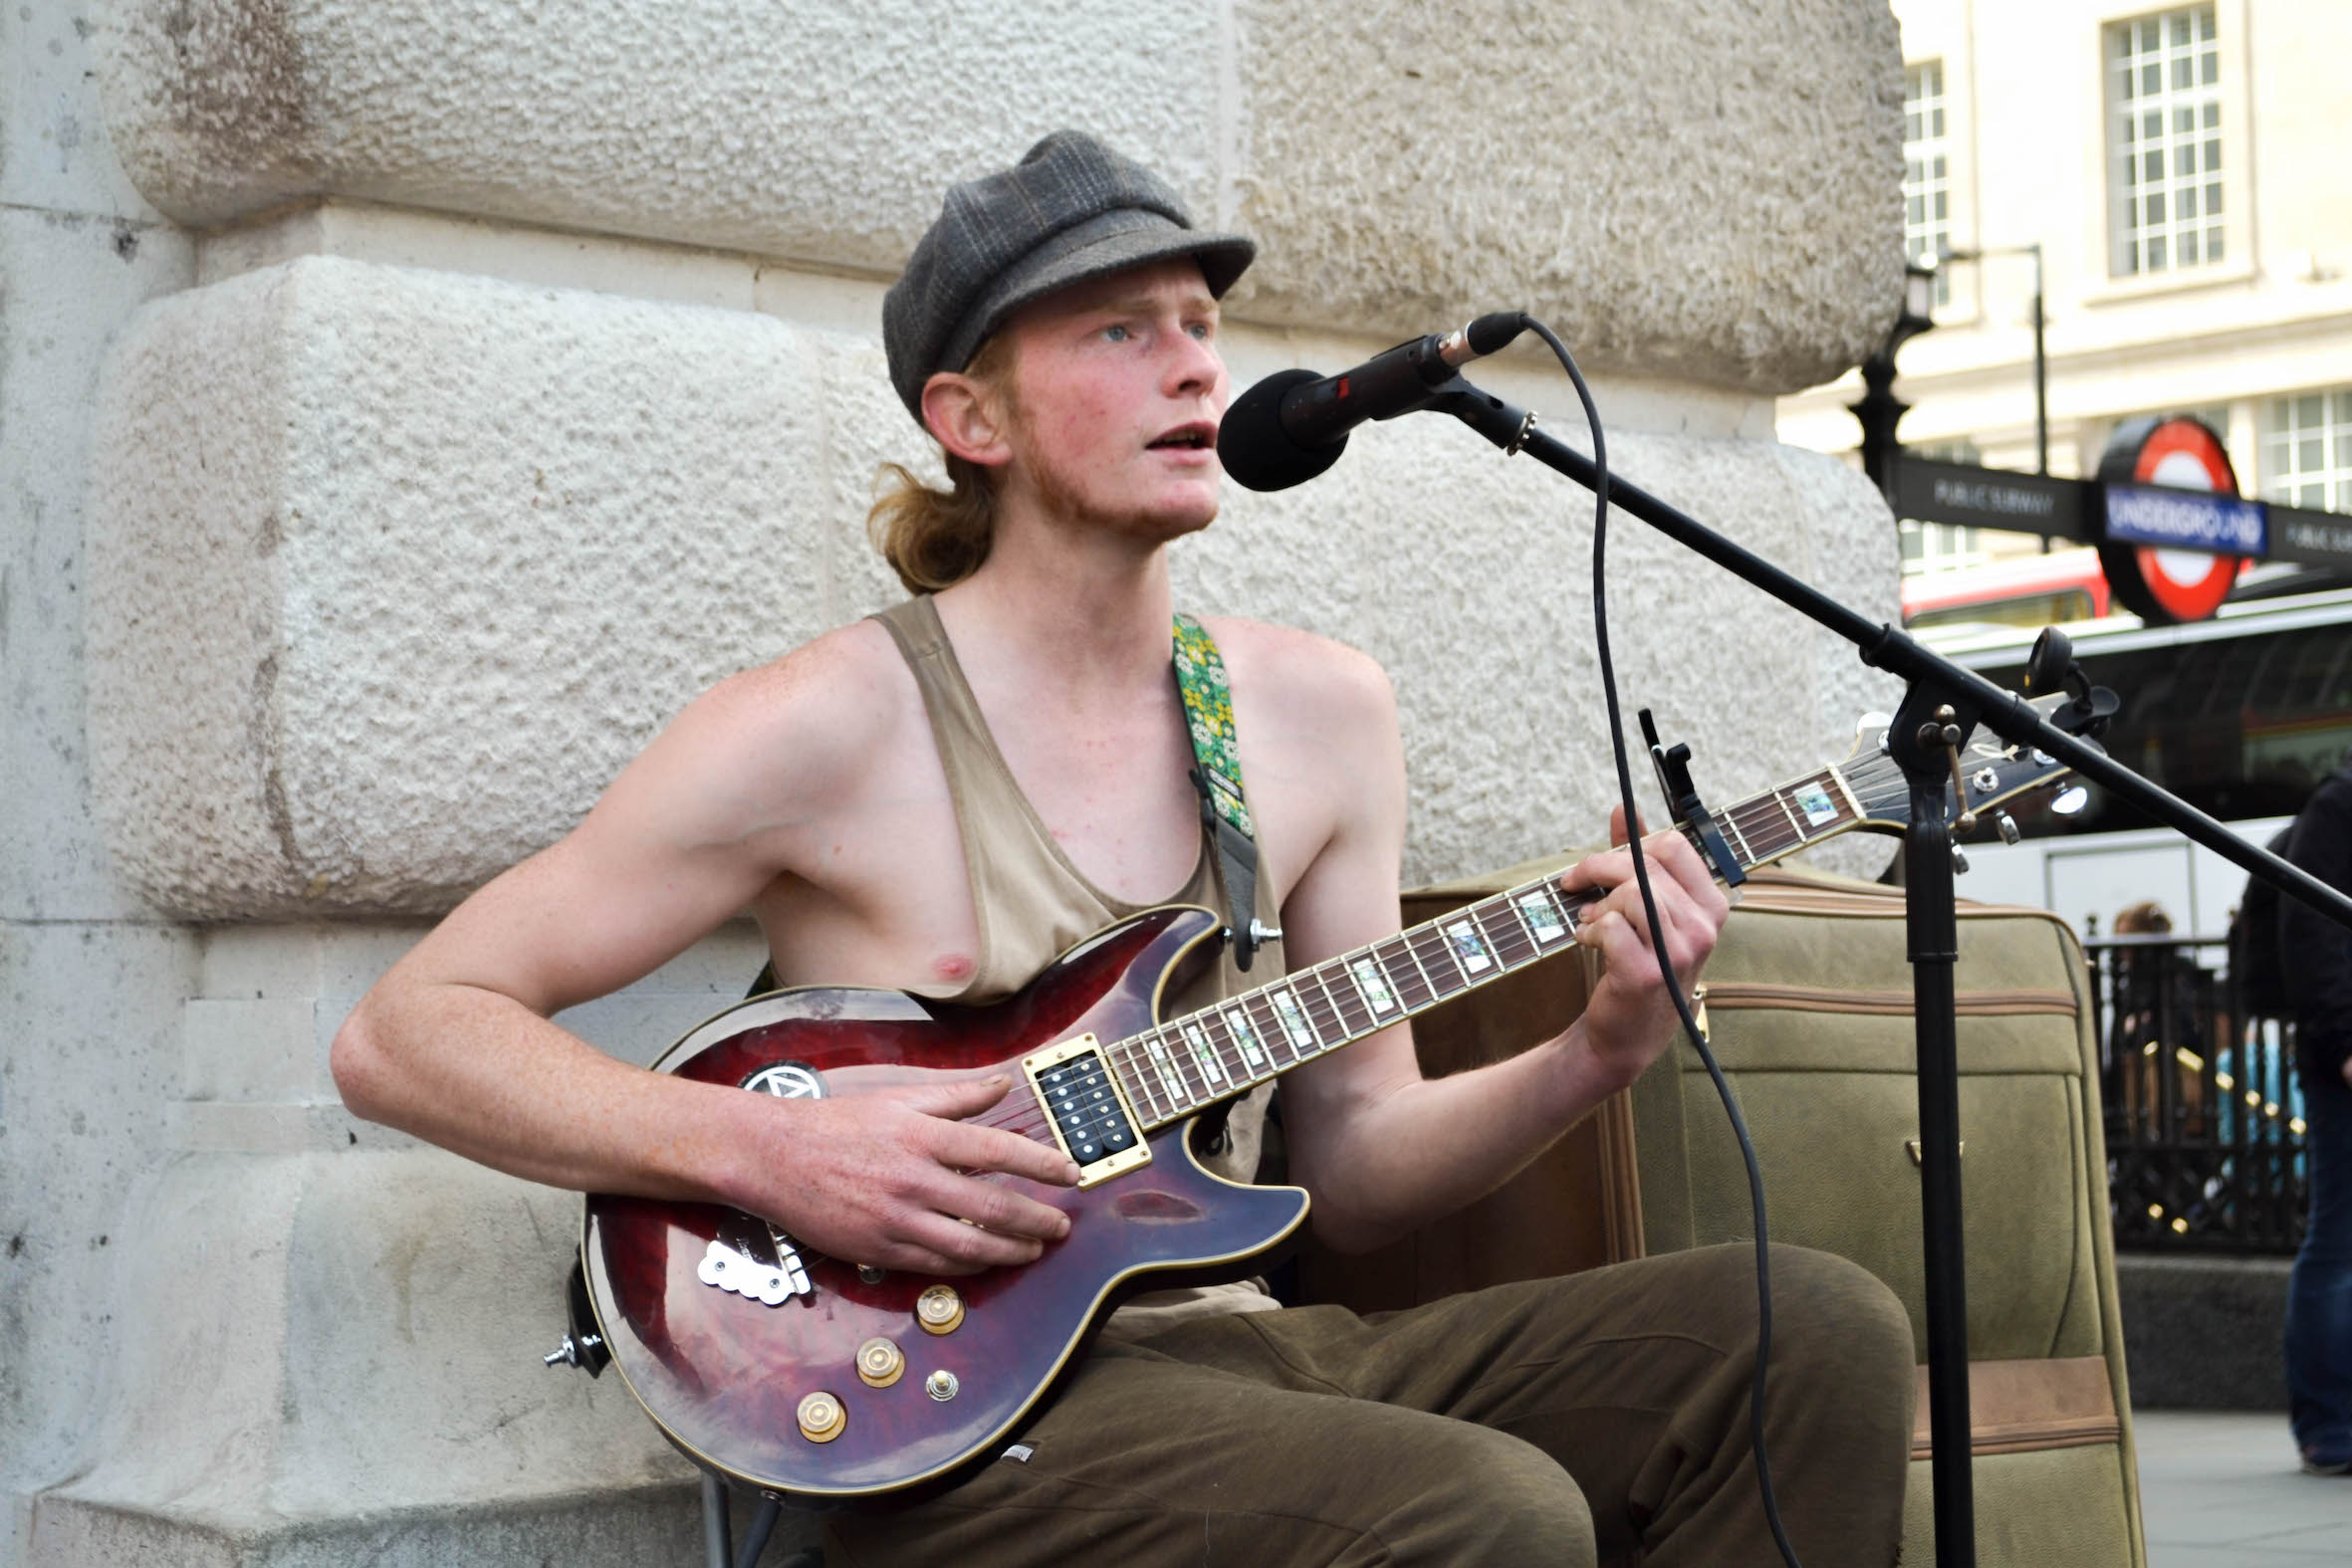 man in string vest playing guitar